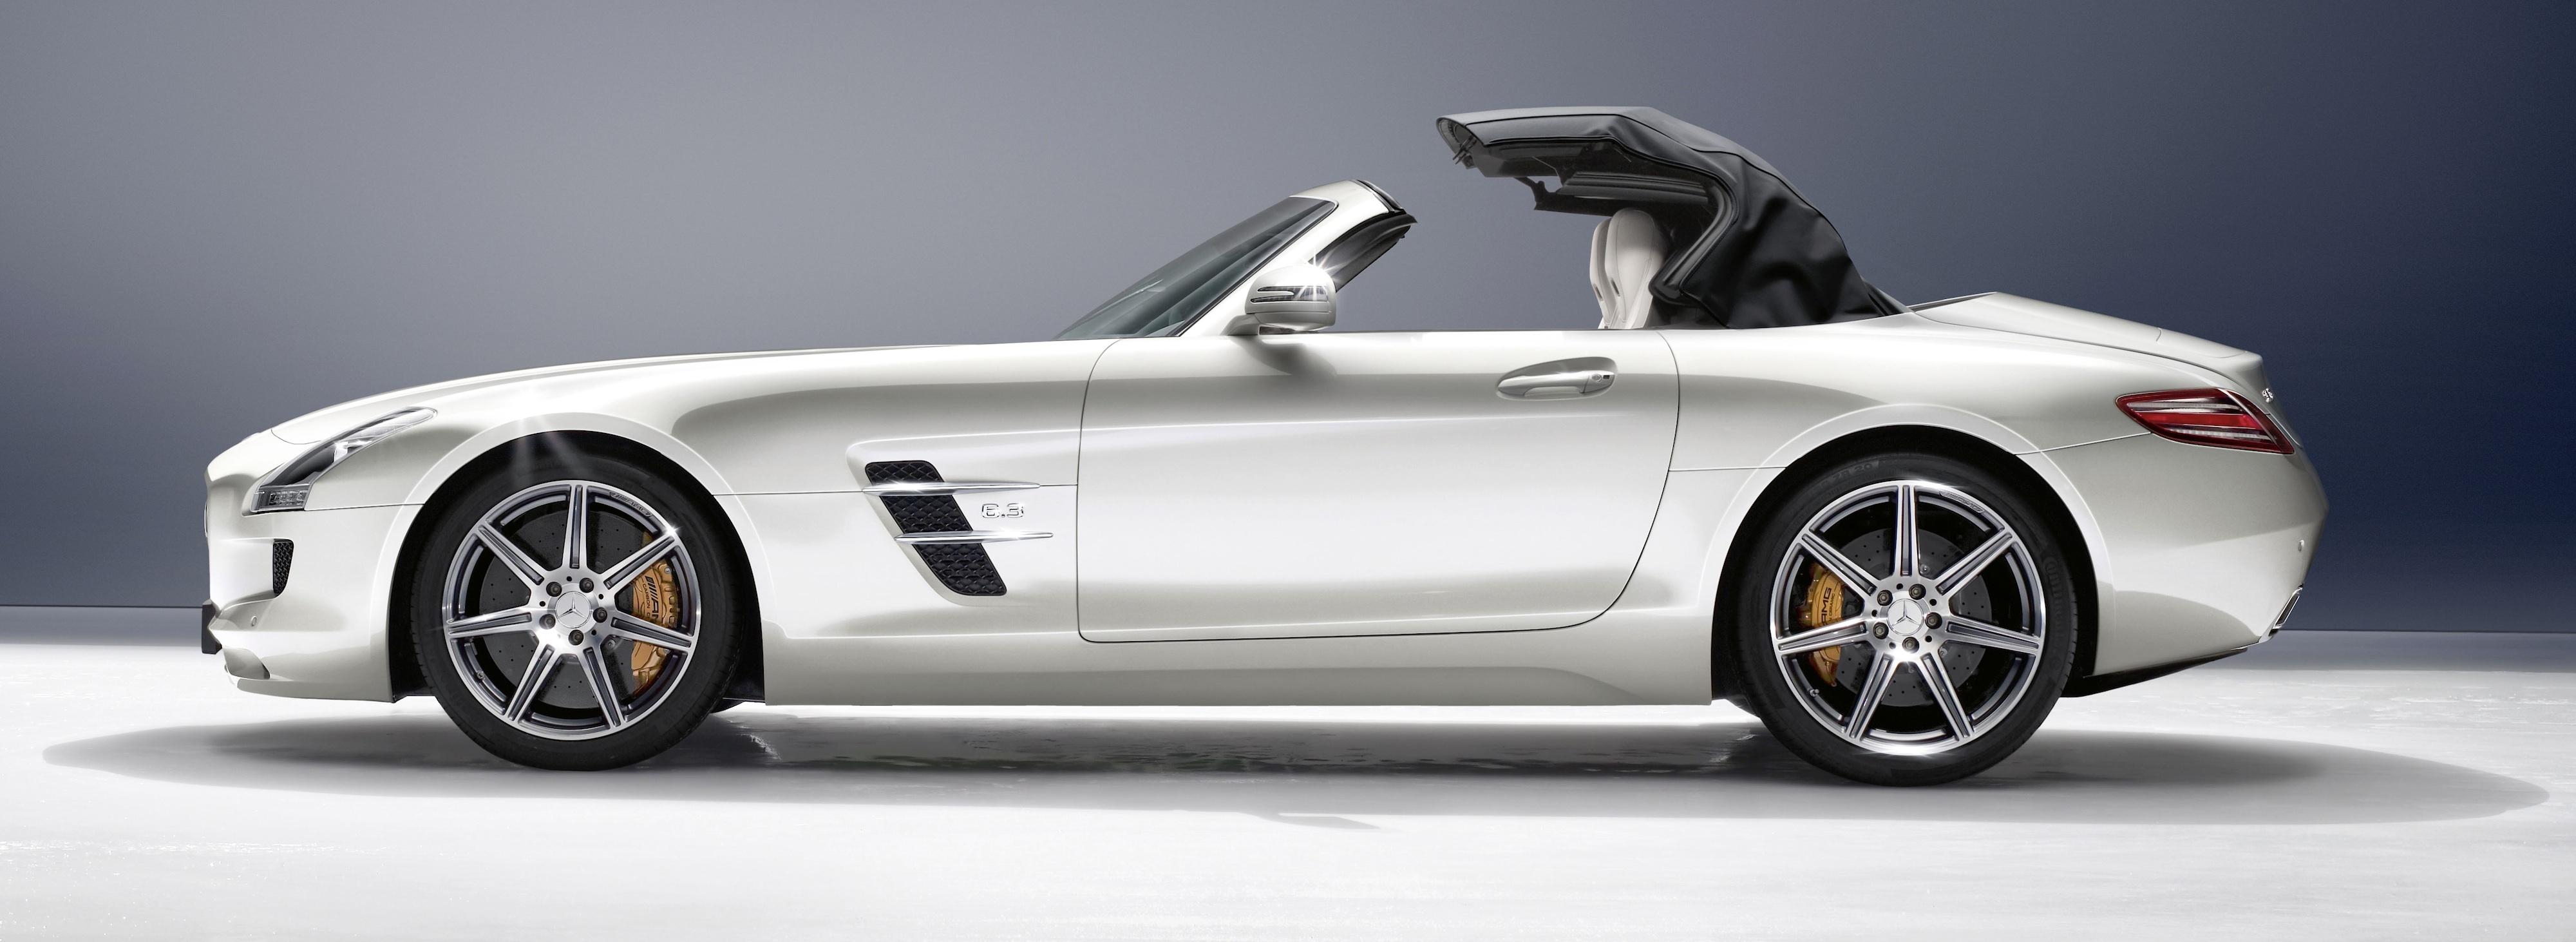 Mercedes Benz SLS Roadster- luxury car rentals of Texas